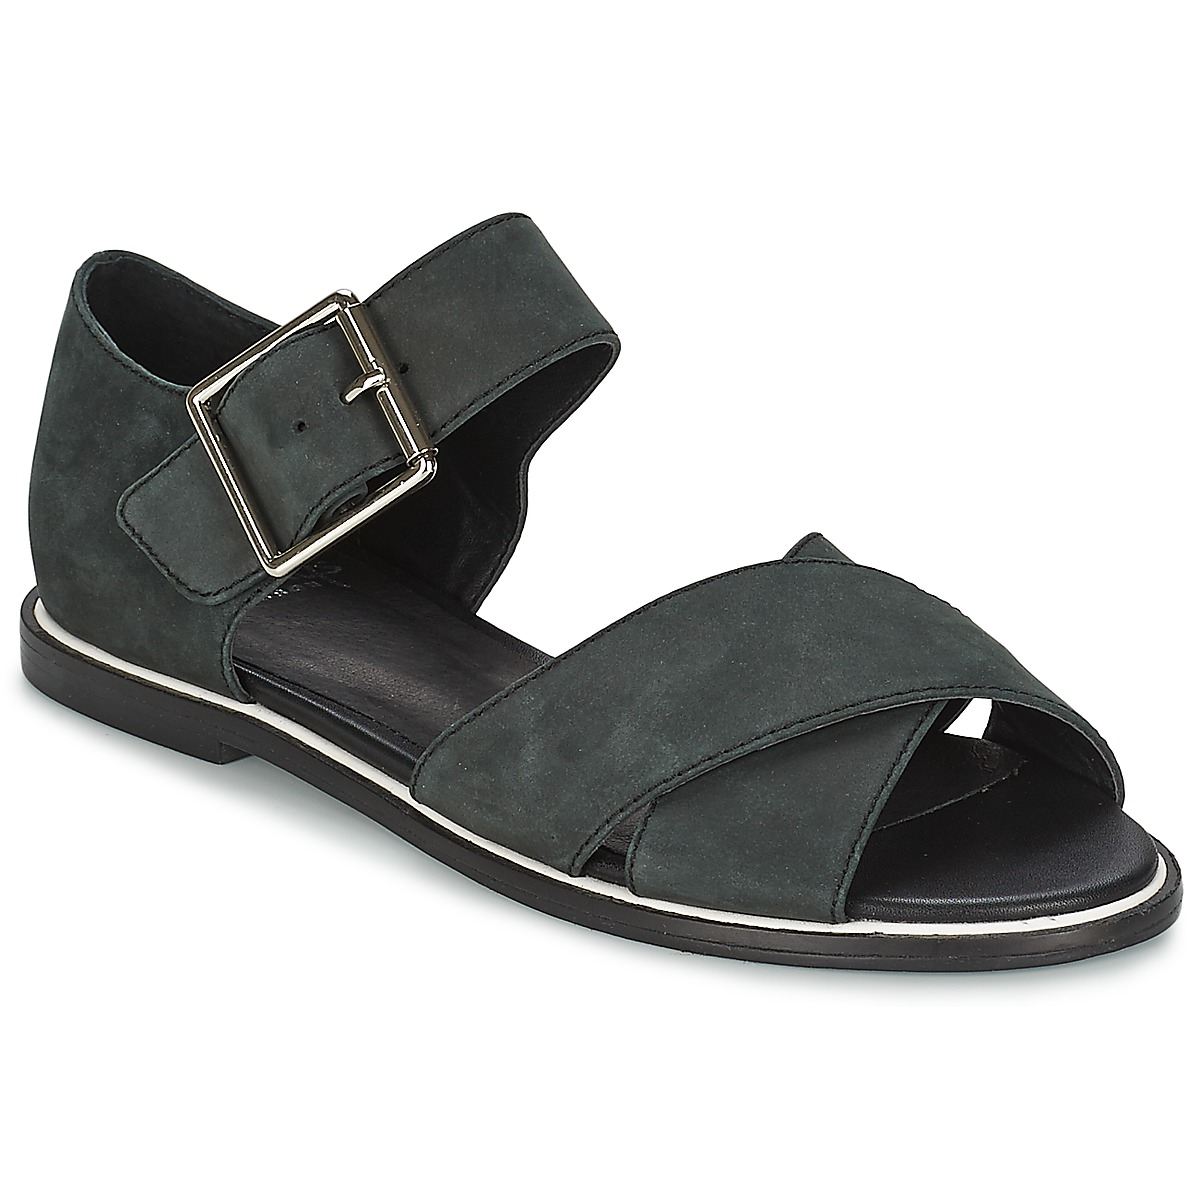 Sandale Shellys London QUEENA Noir